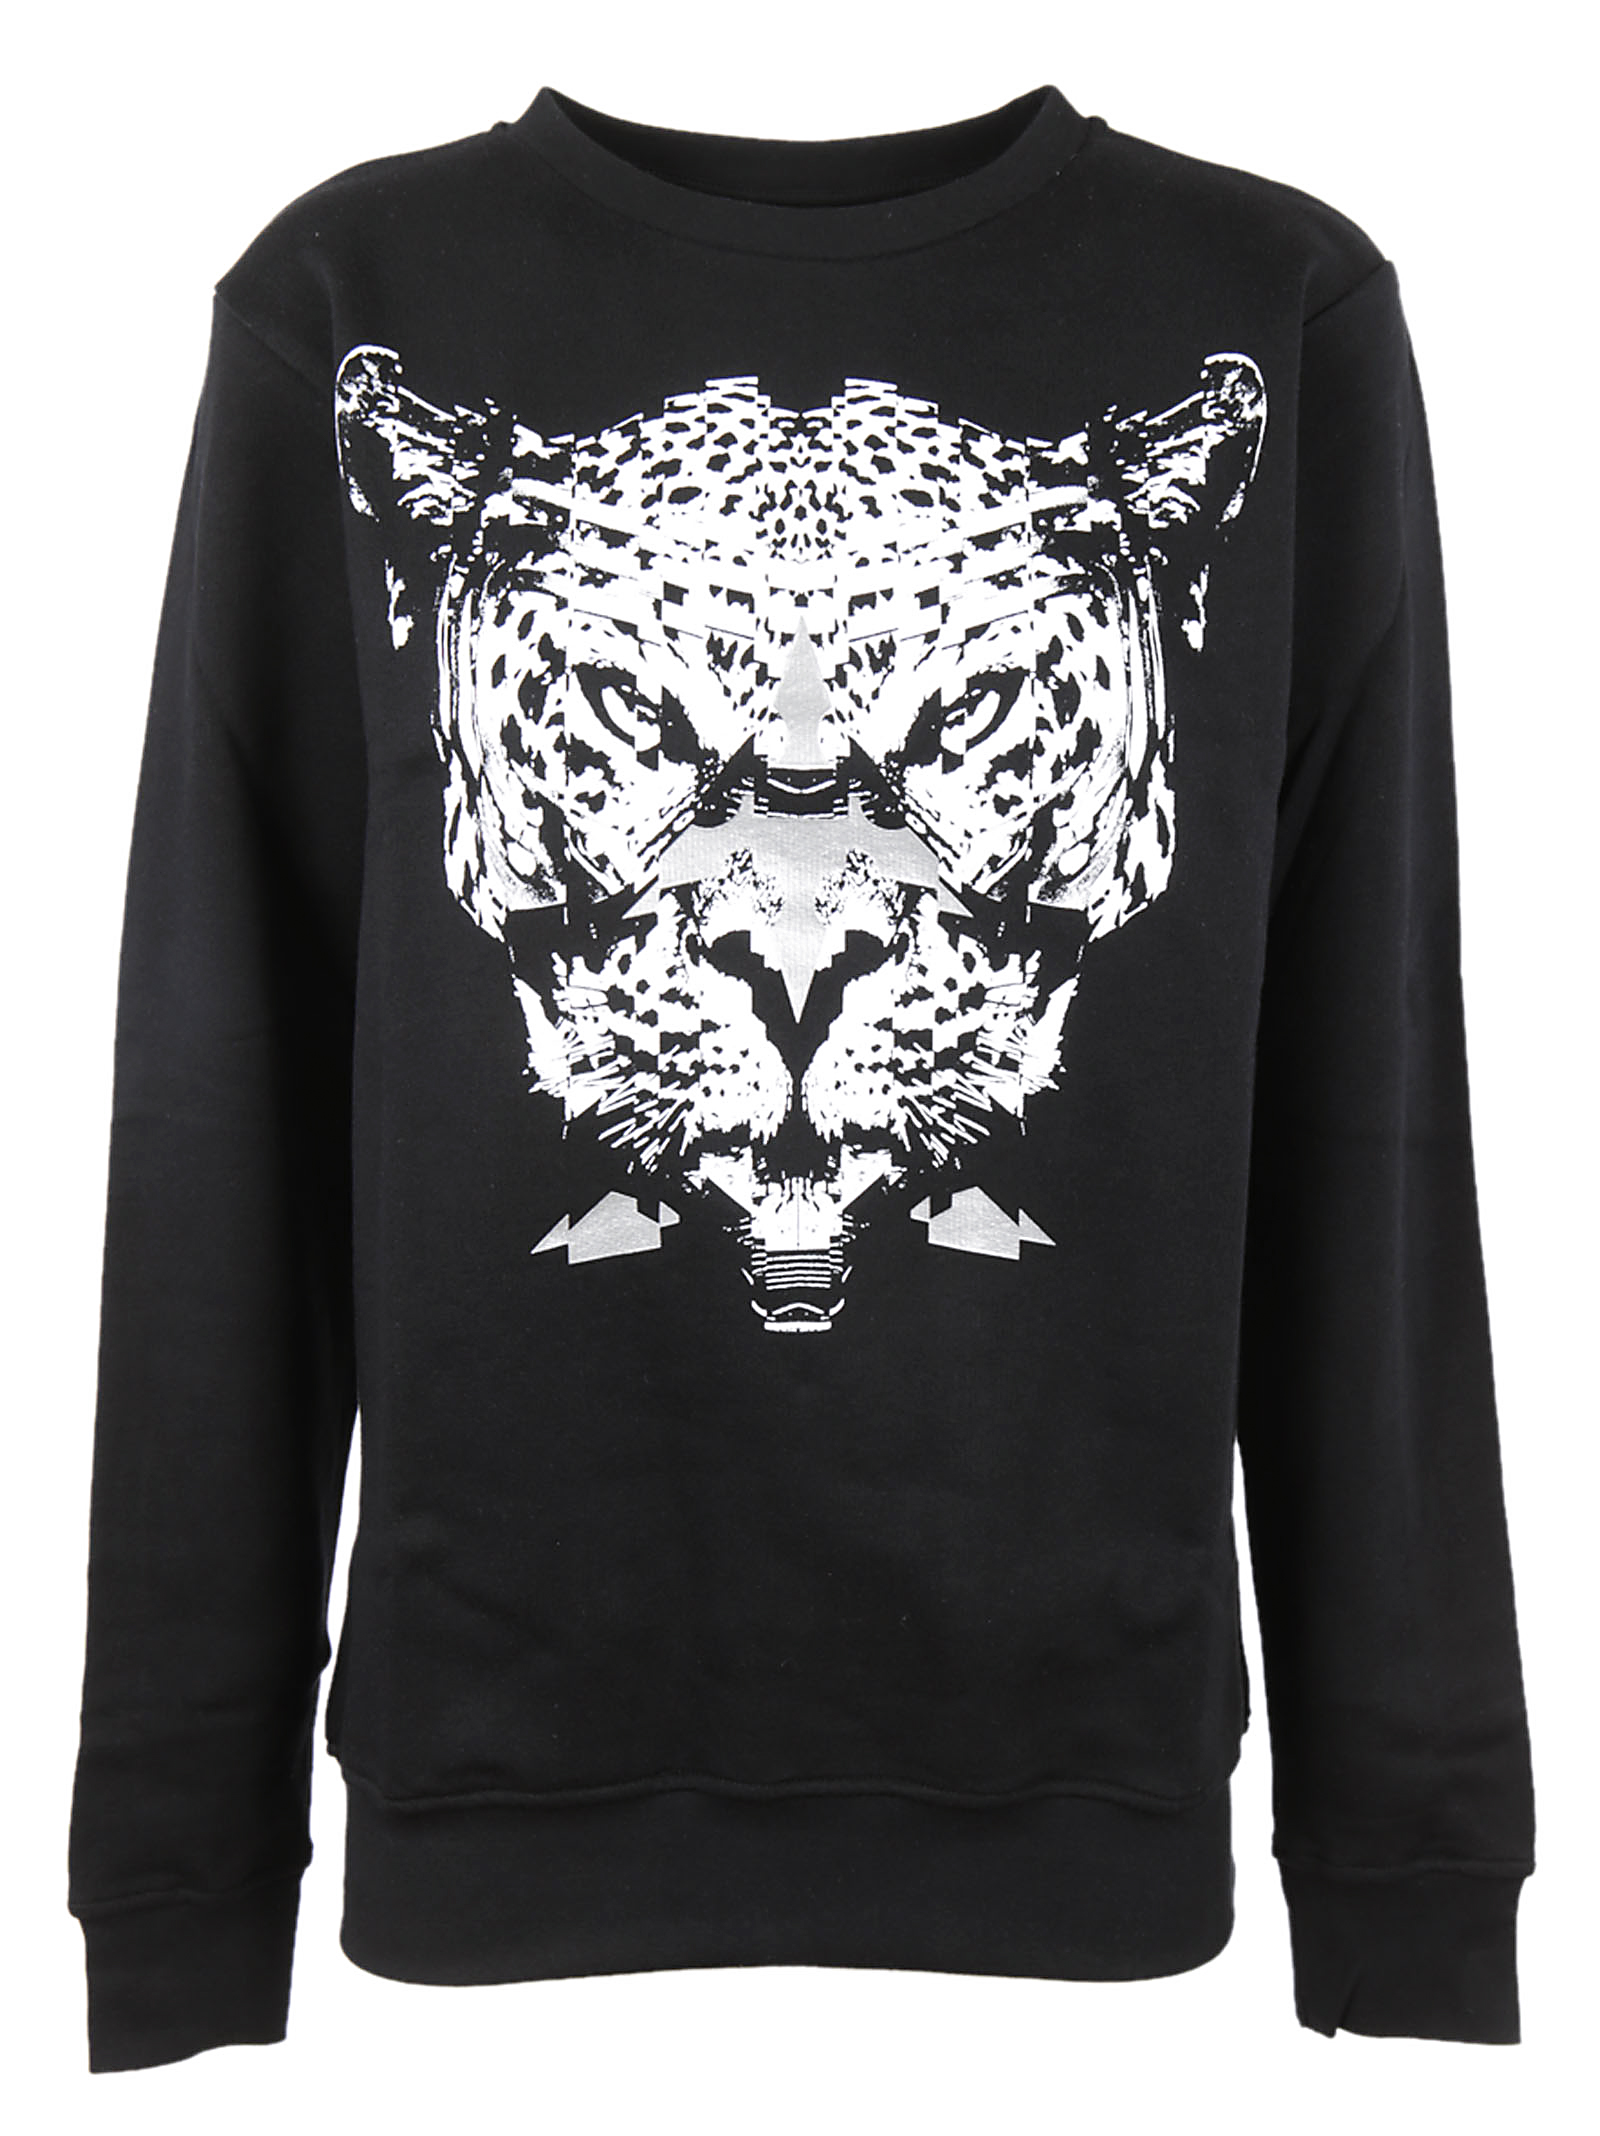 MARCELO BURLON WOMAN Marcelo Burlon Leopard Print Sweatshirt